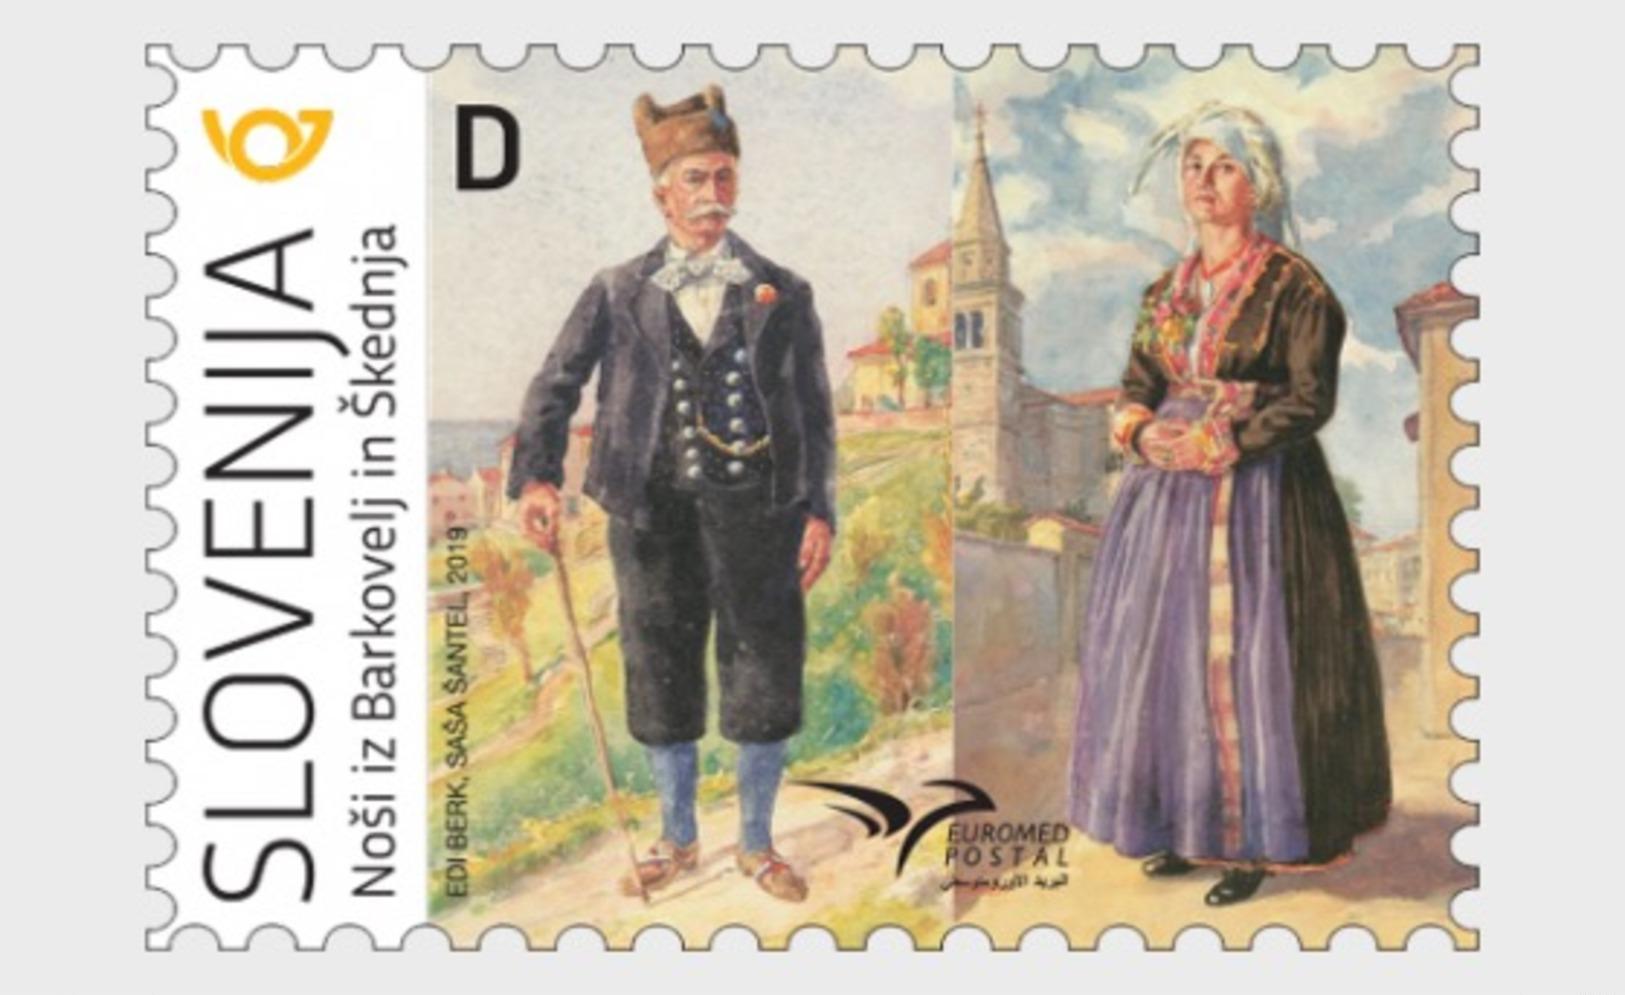 H01 Slovenia 2019 Euromed Postal - Costumes Of The Mediterranean MNH Postfrisch - Slowenien